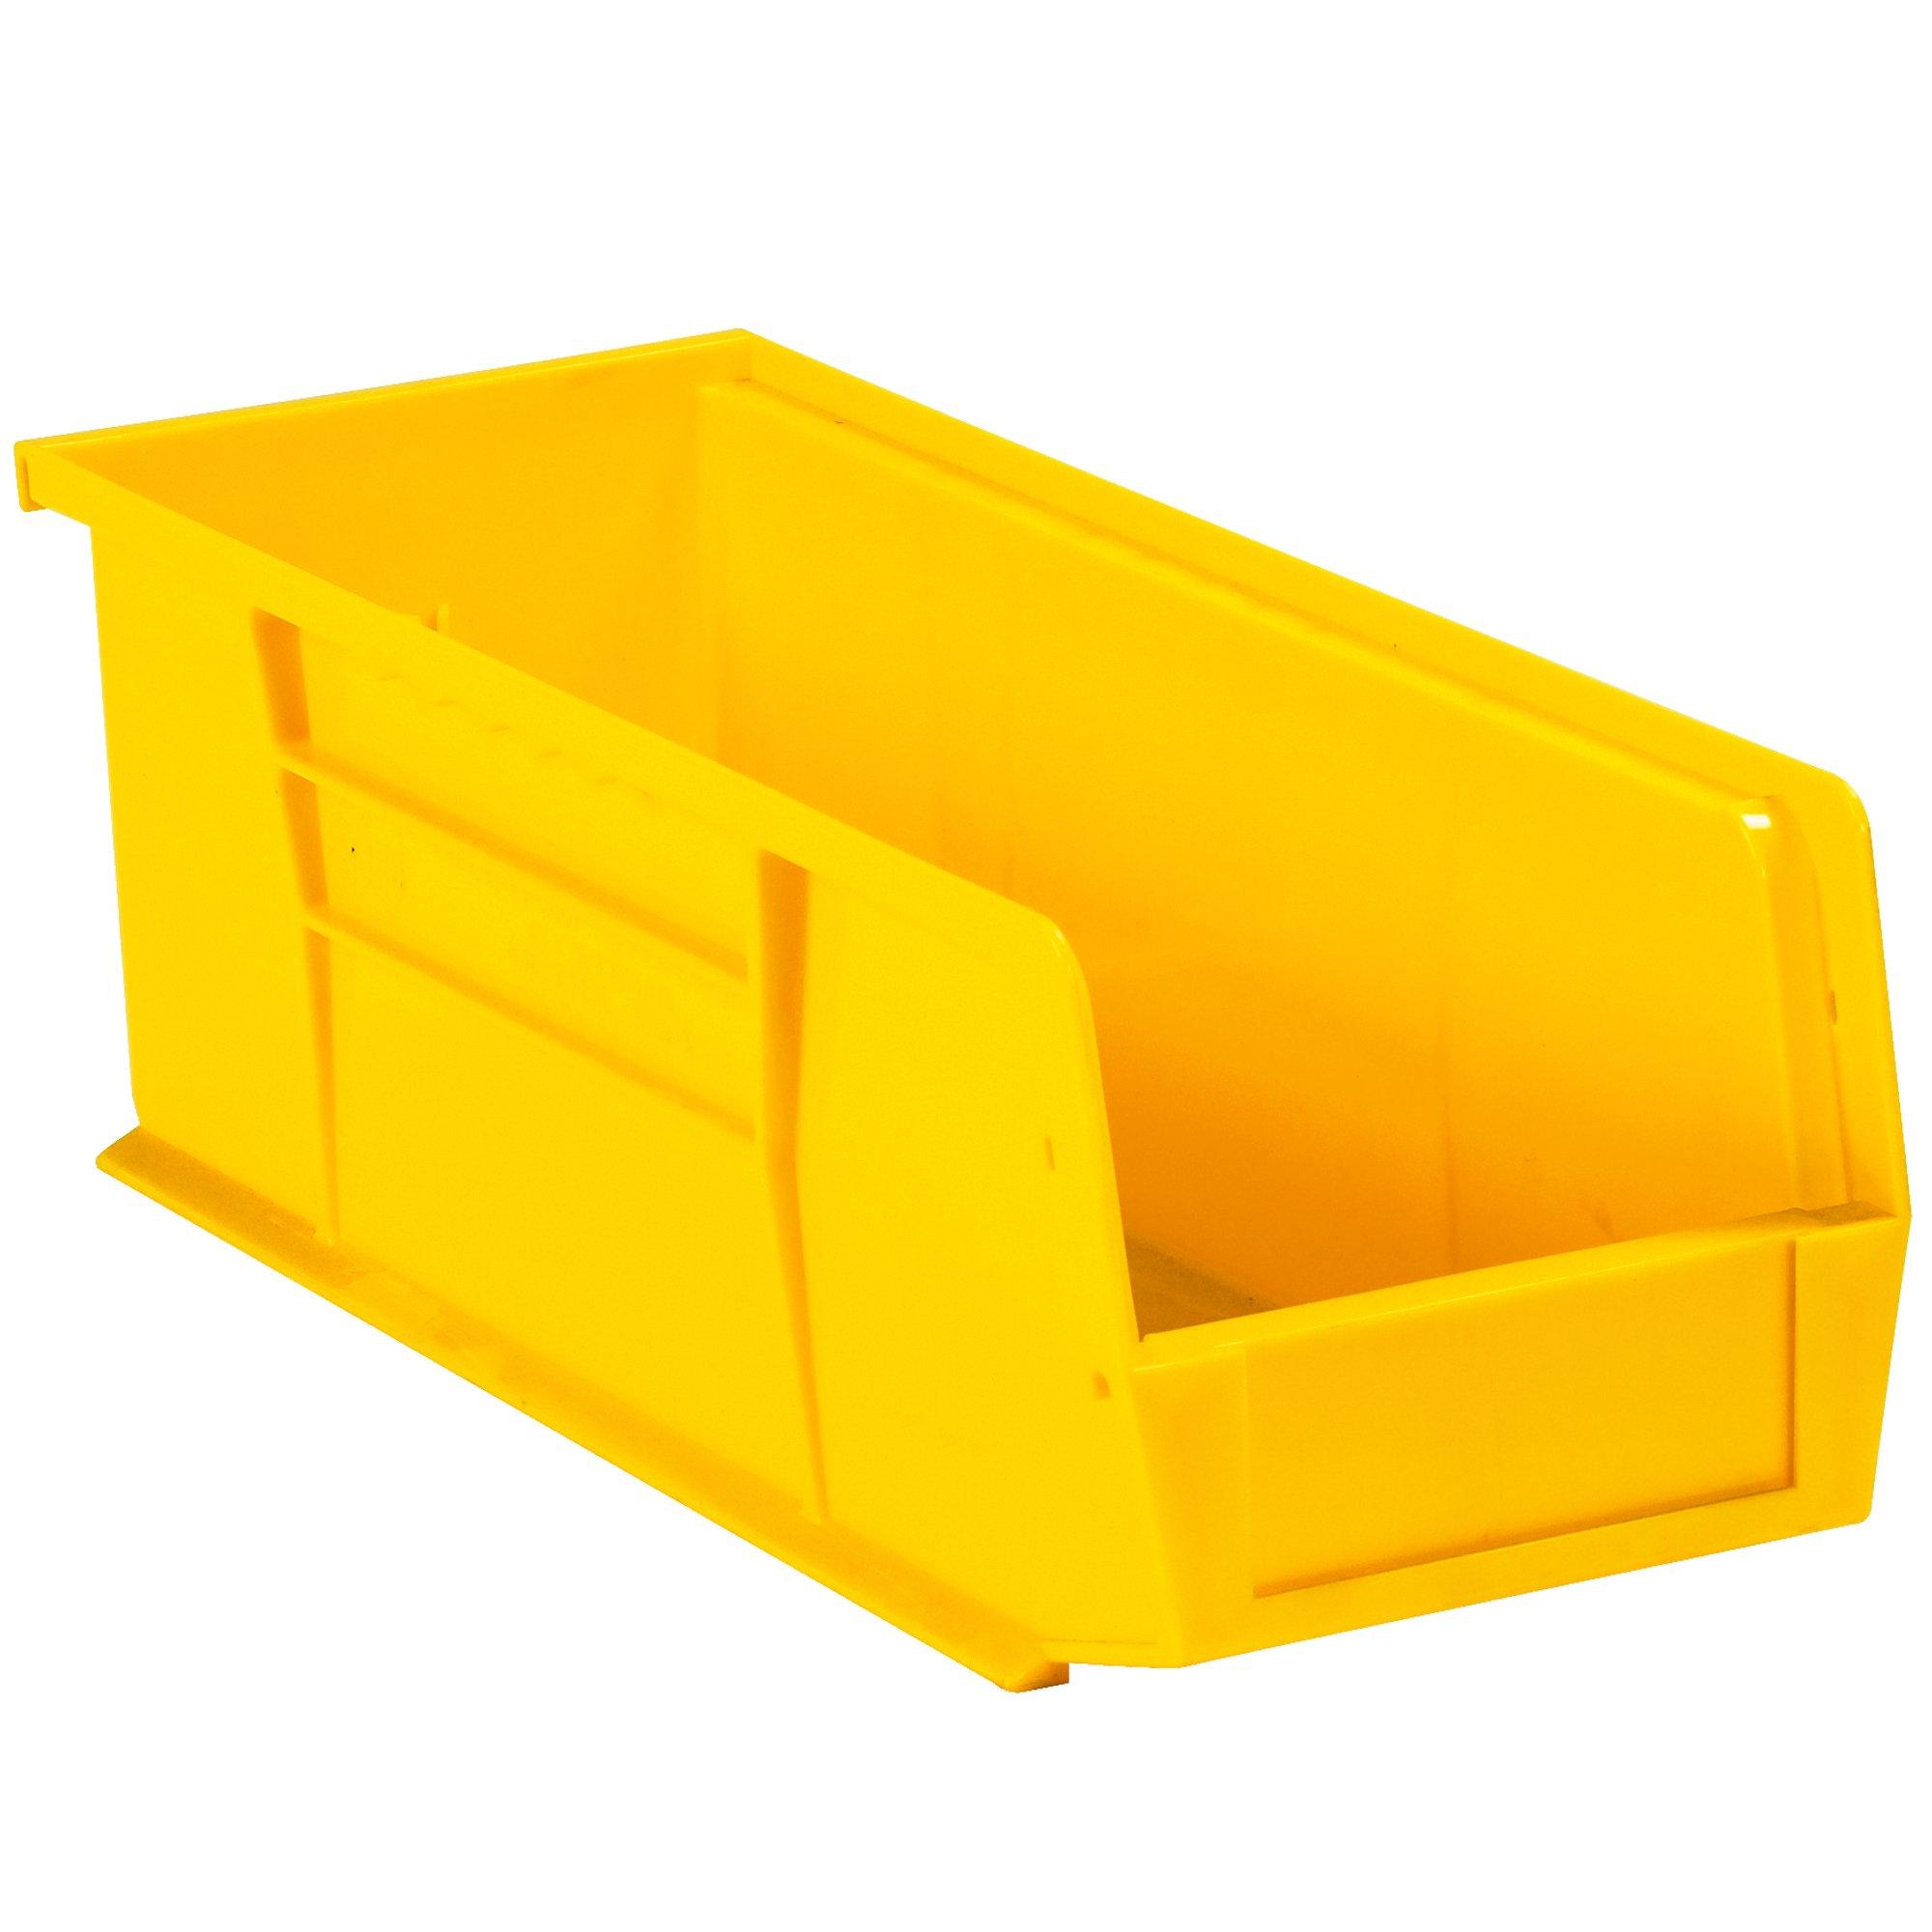 Aviditi BINP1555Y Plastic Stack and Hang Bin Boxes, 14 3/4'' x 5 1/2'' x 5'', Yellow (Pack of 12)